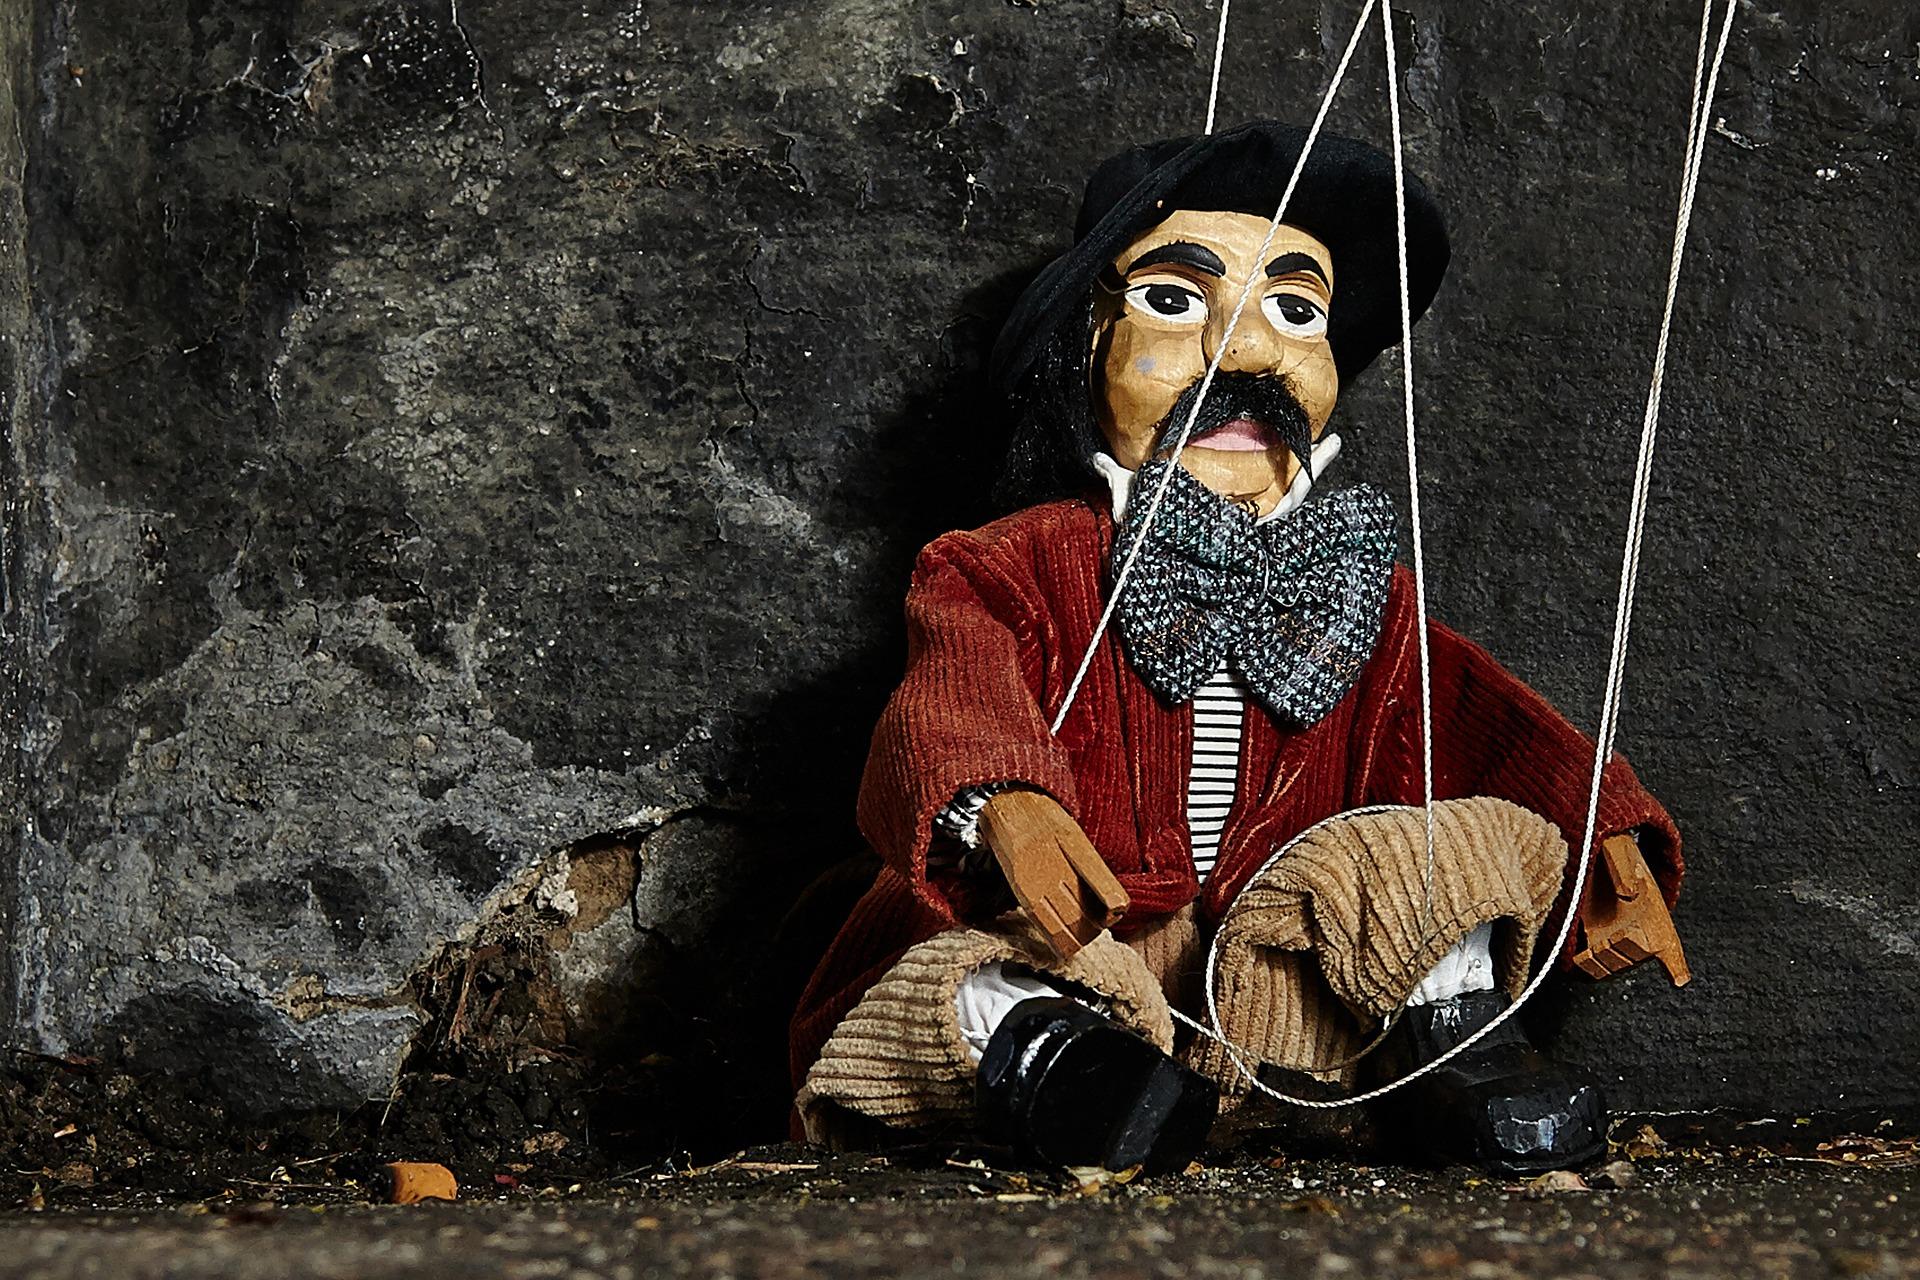 marionette-2470594_1920